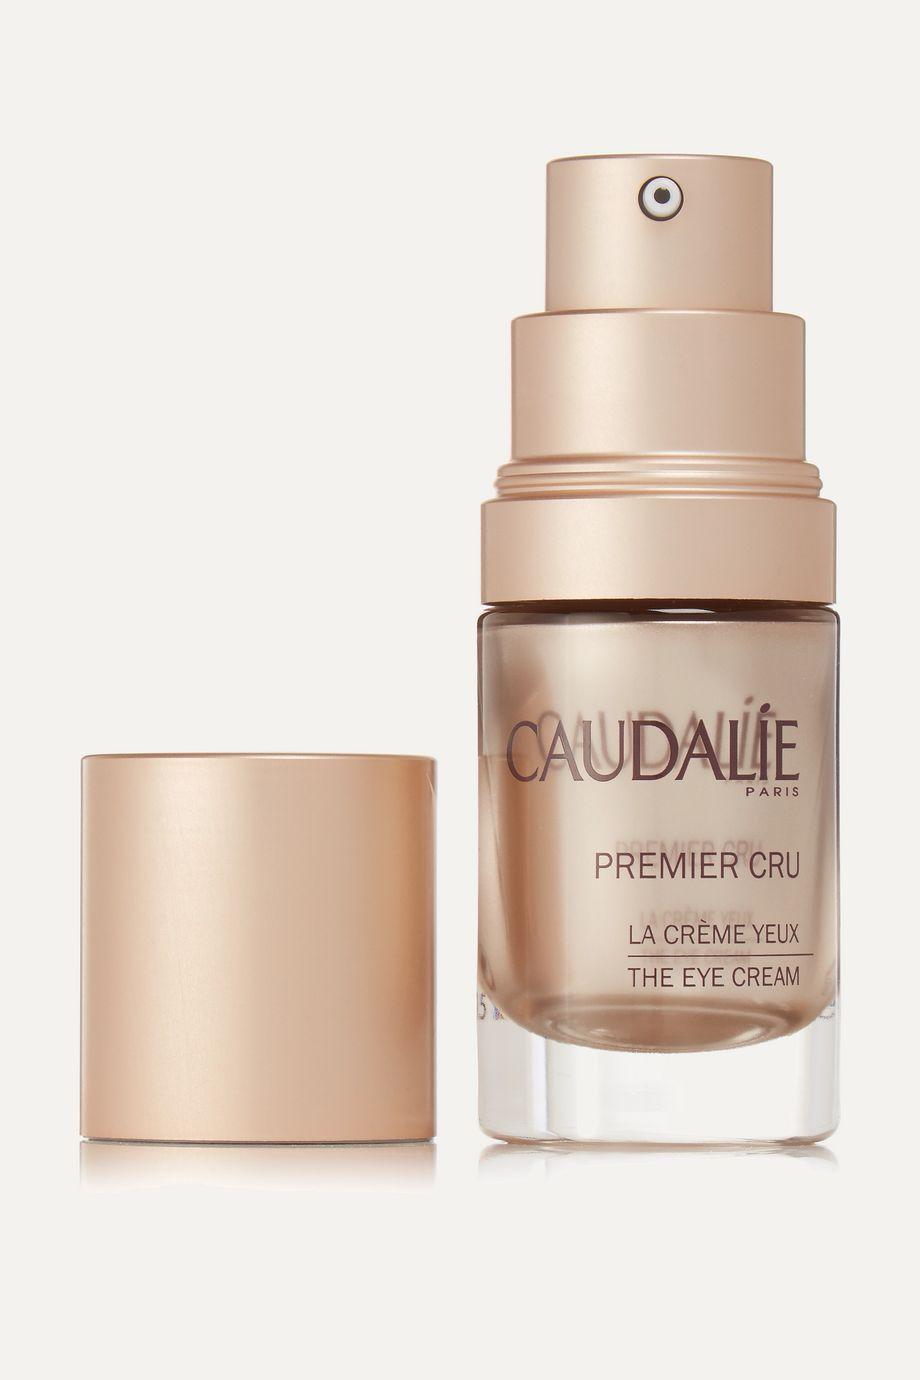 Caudalie Premier Cru The Eye Cream, 15ml